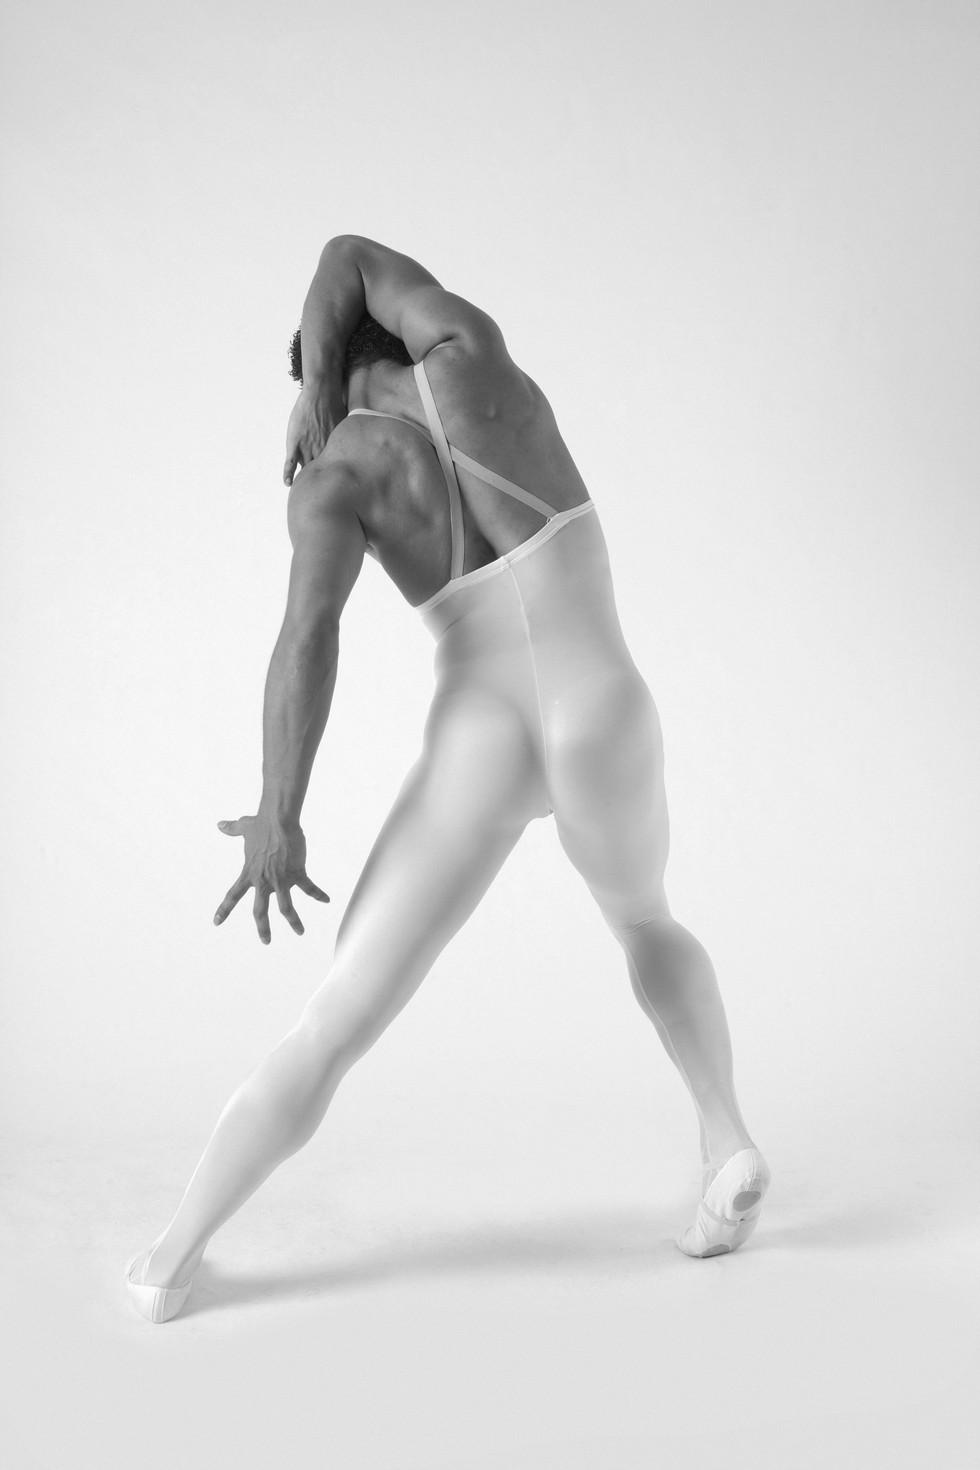 Balletic Empathy